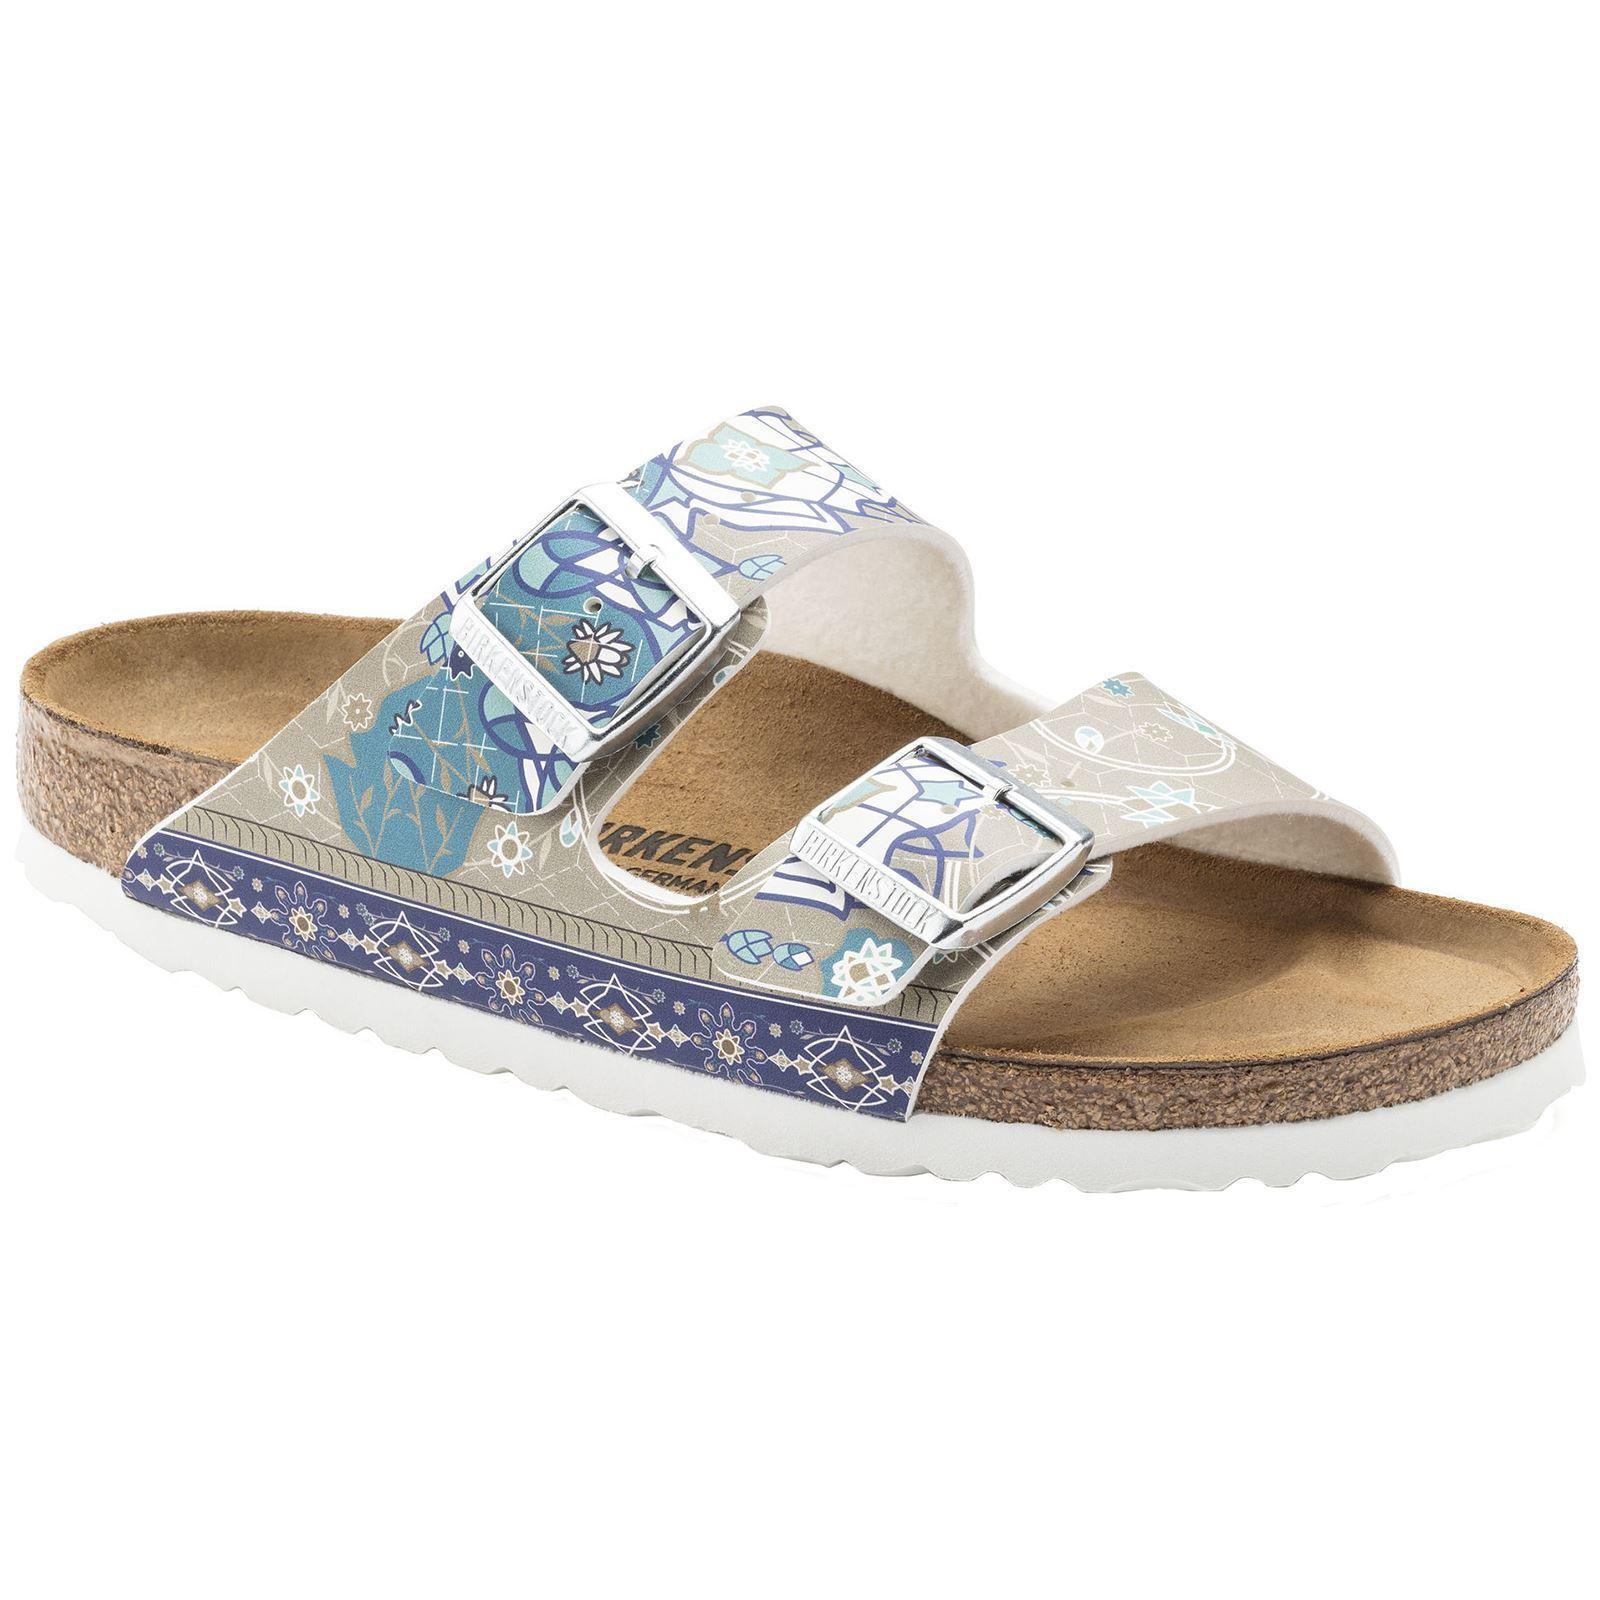 Último gran descuento Birkenstock Arizona Ancient Mosaic Taupe Womens Birko-Flor Slide Sandals